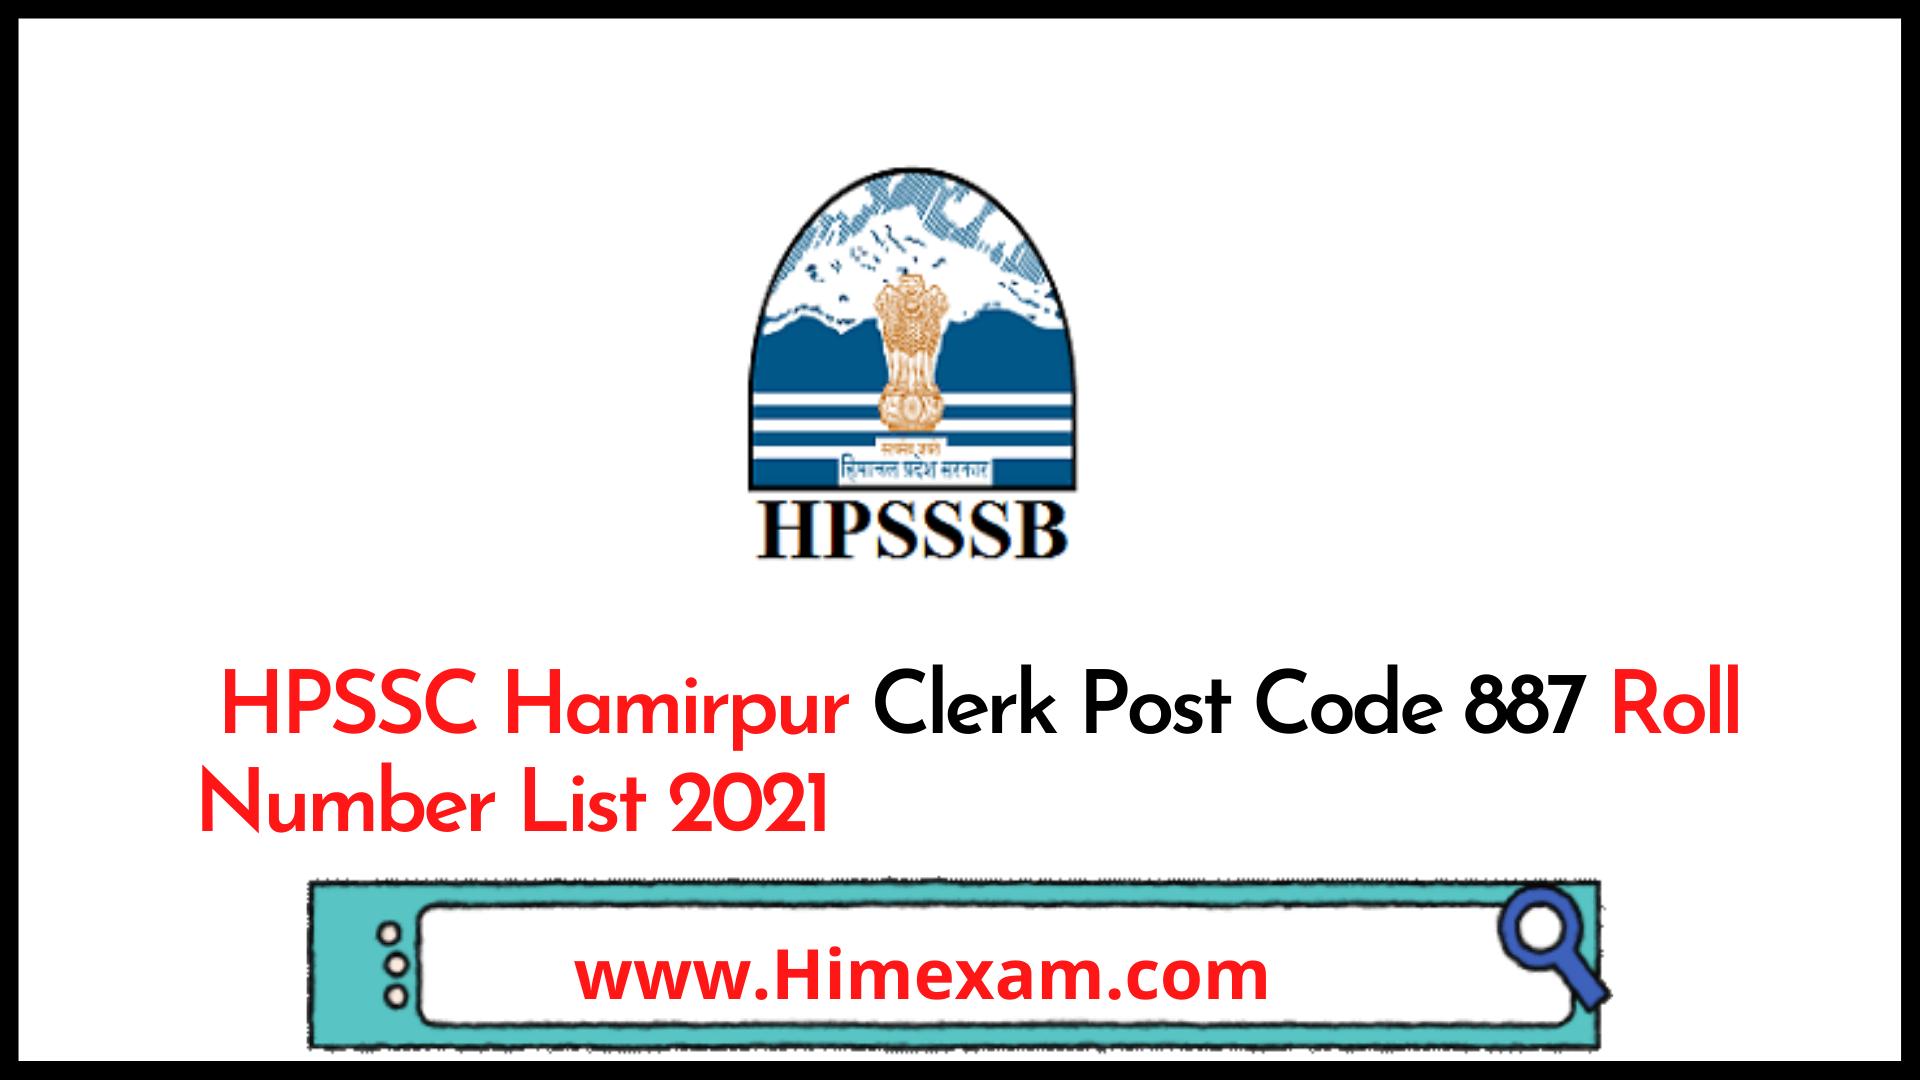 HPSSC Hamirpur Clerk Post Code 887 Roll Number List 2021